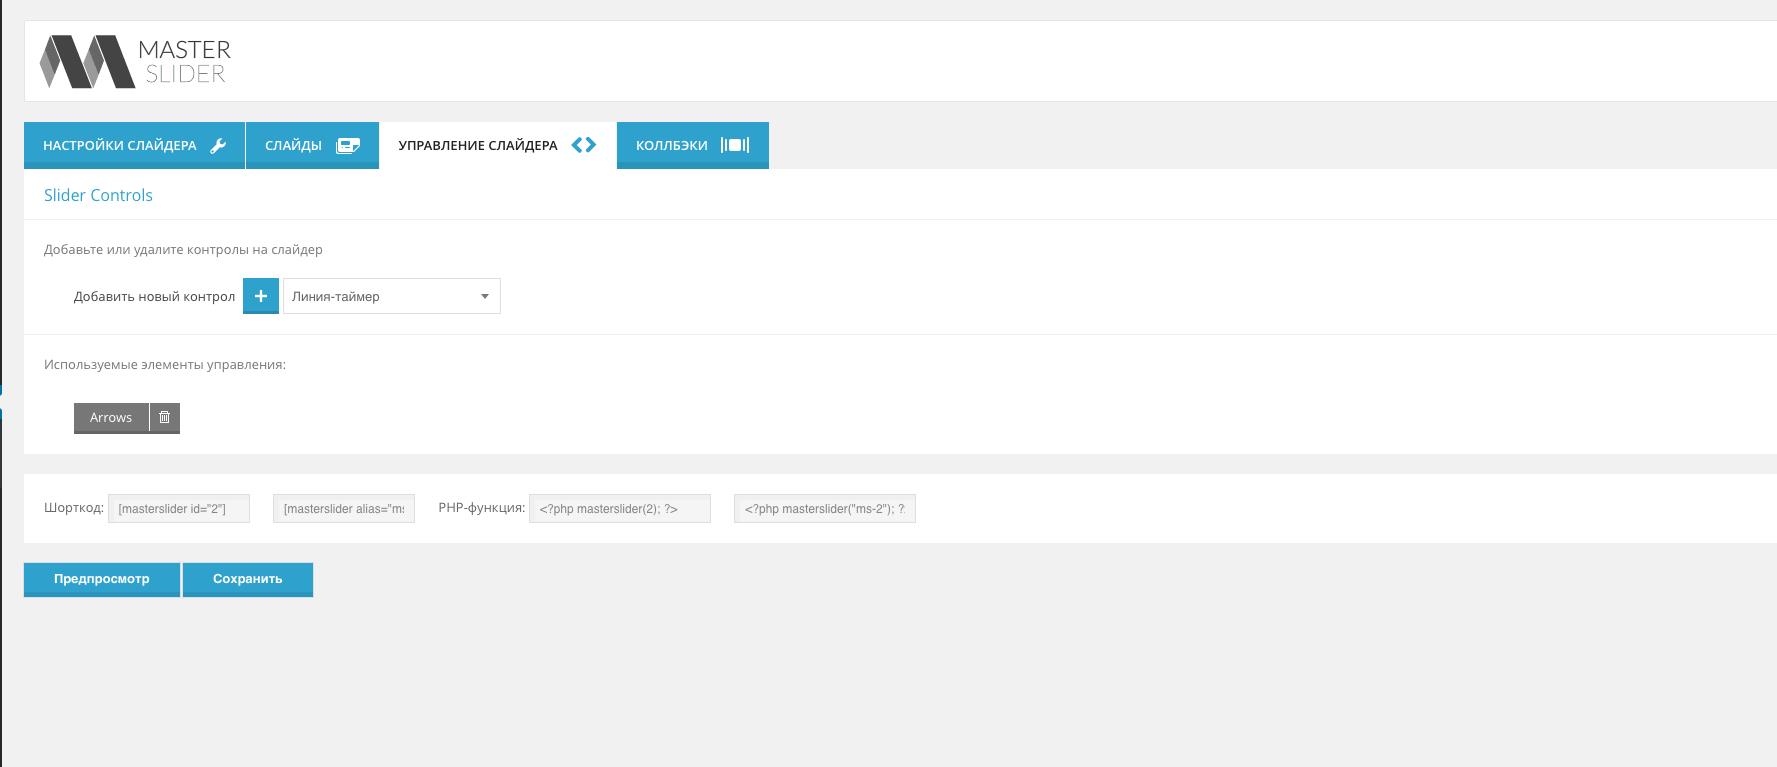 master slider, master slider скачать, master slider wordpress, темы для wordpress на русском, бесплатные темы для wordpress